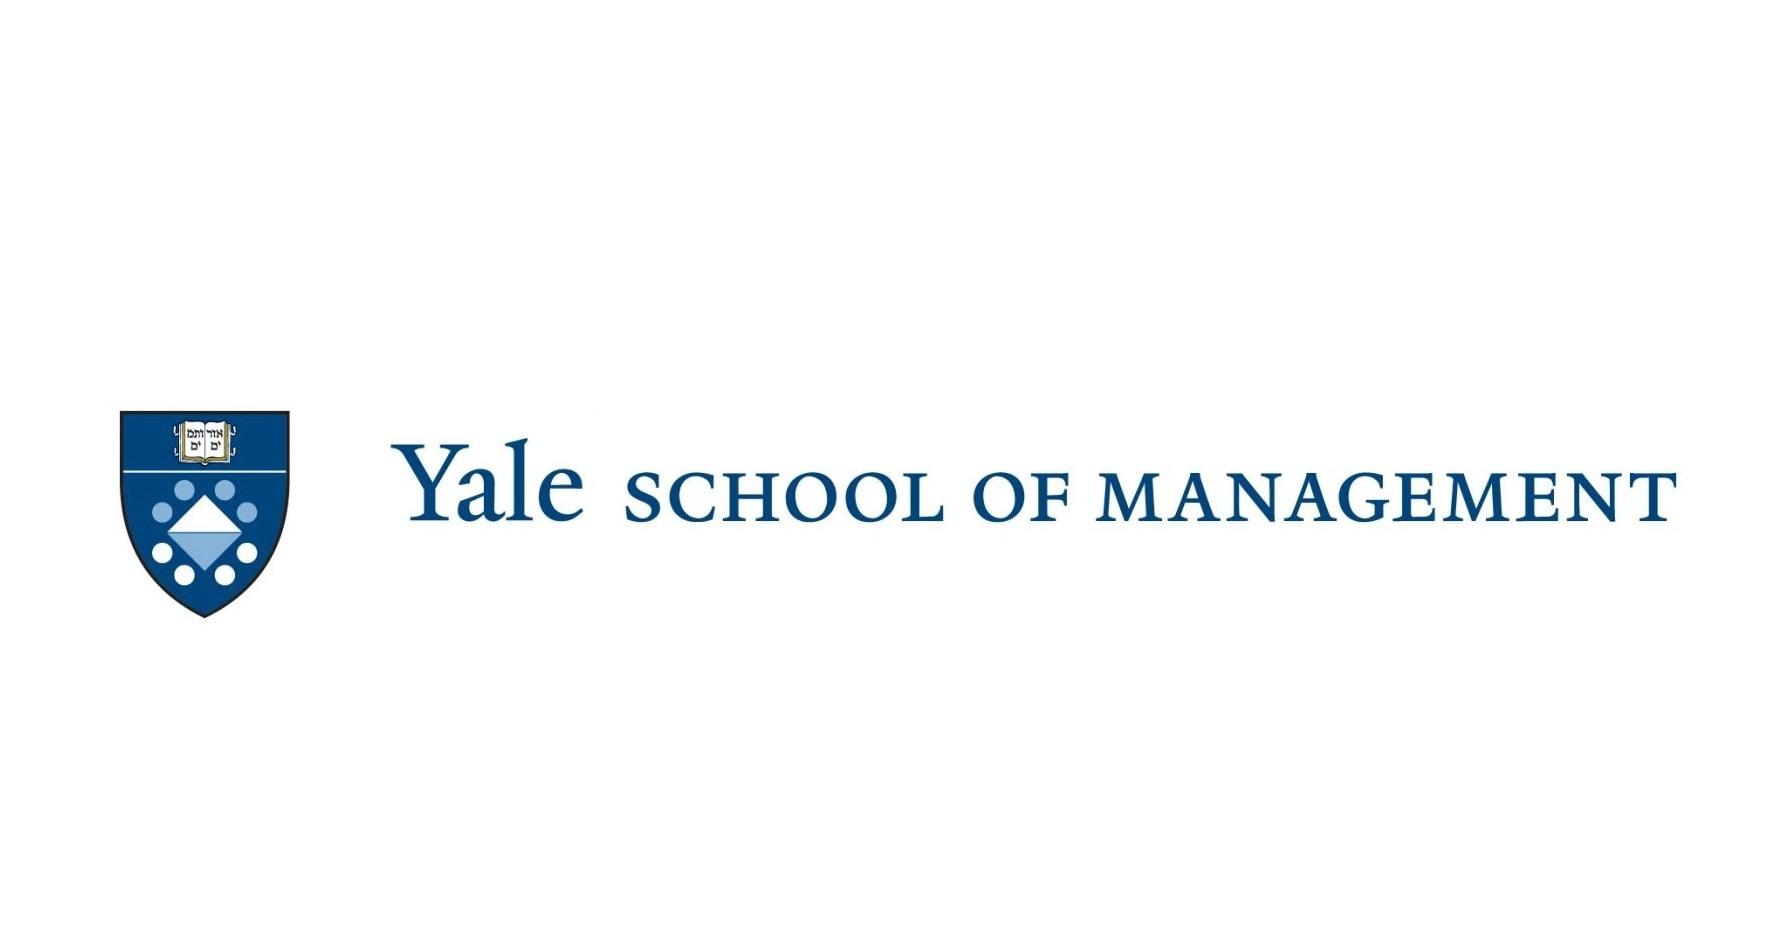 Yale+University%2C+Yale+SOM%2C+MBA%2C+Deferred+MBA%2C+Best+Admissions+Consultant